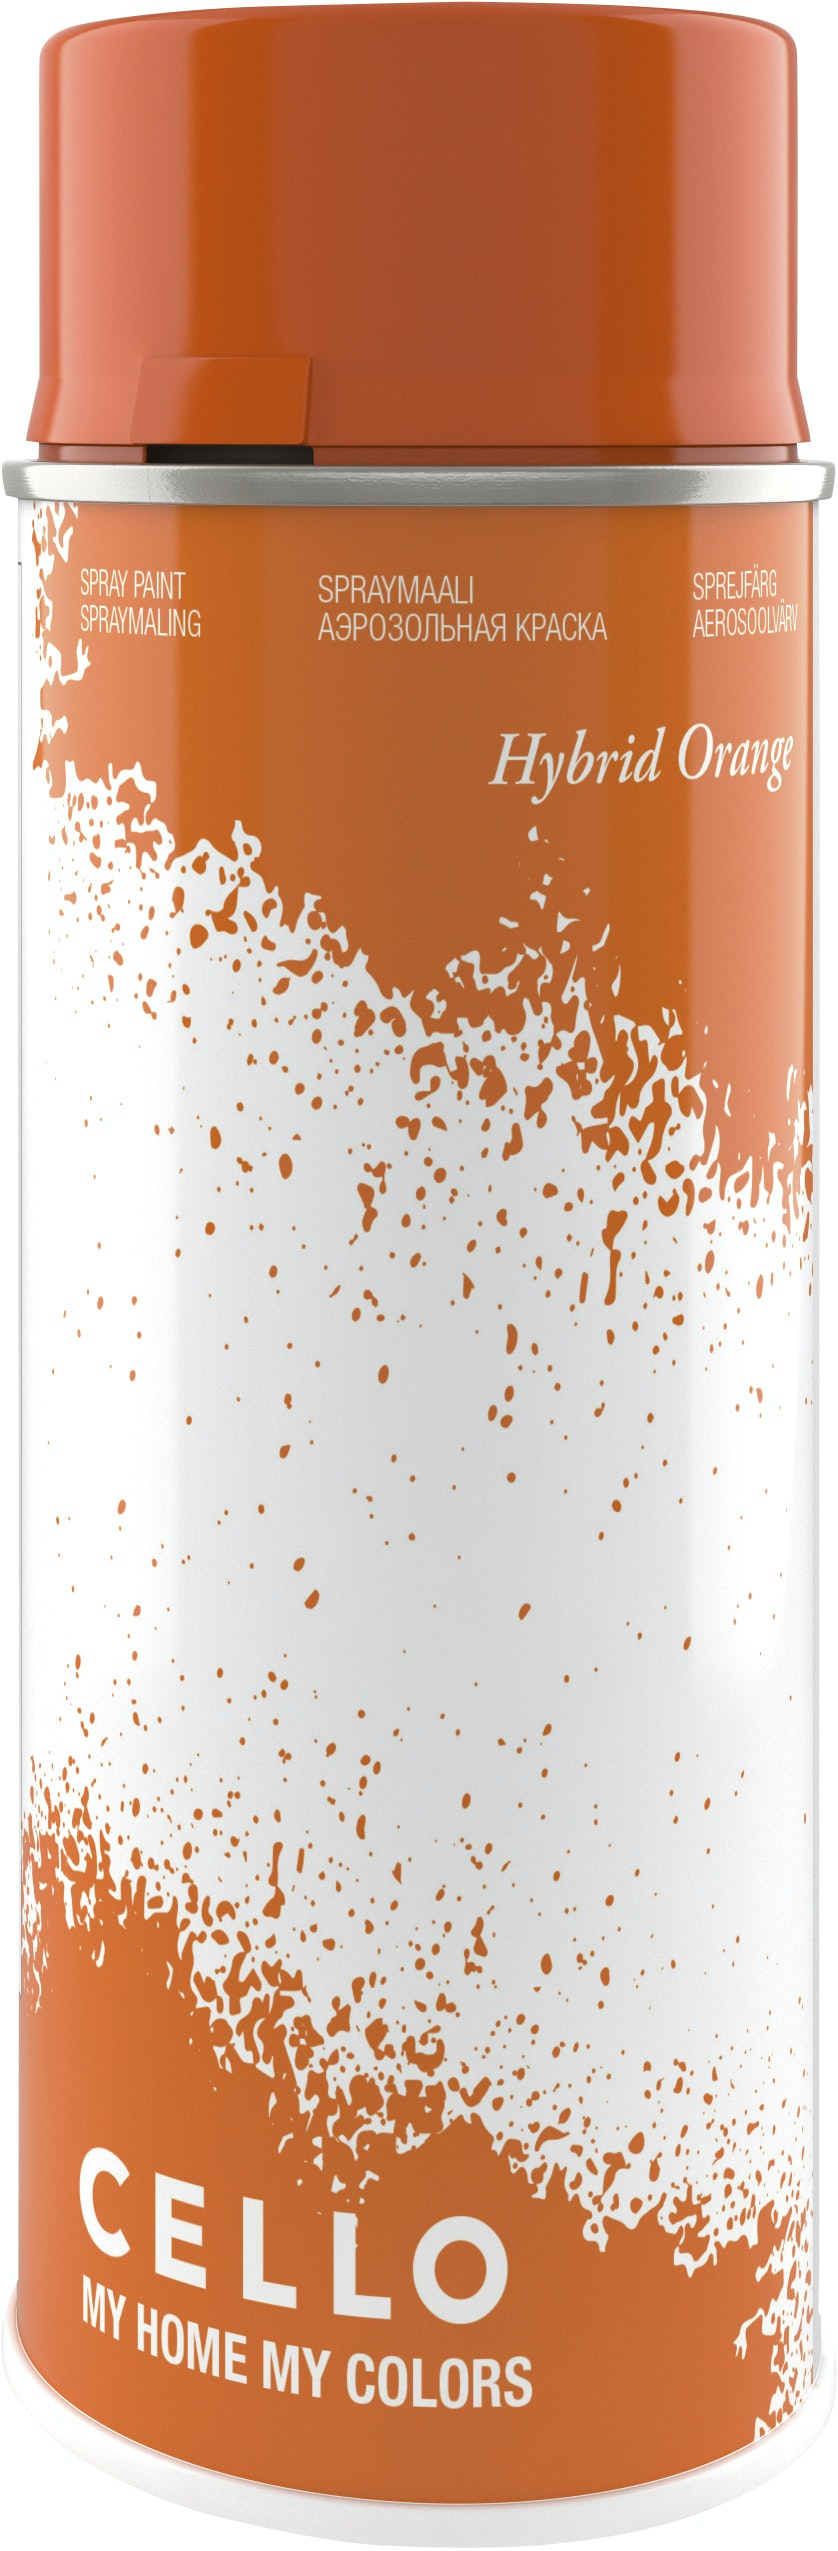 Sprayfärg Cello Hybrid Orange 400ml